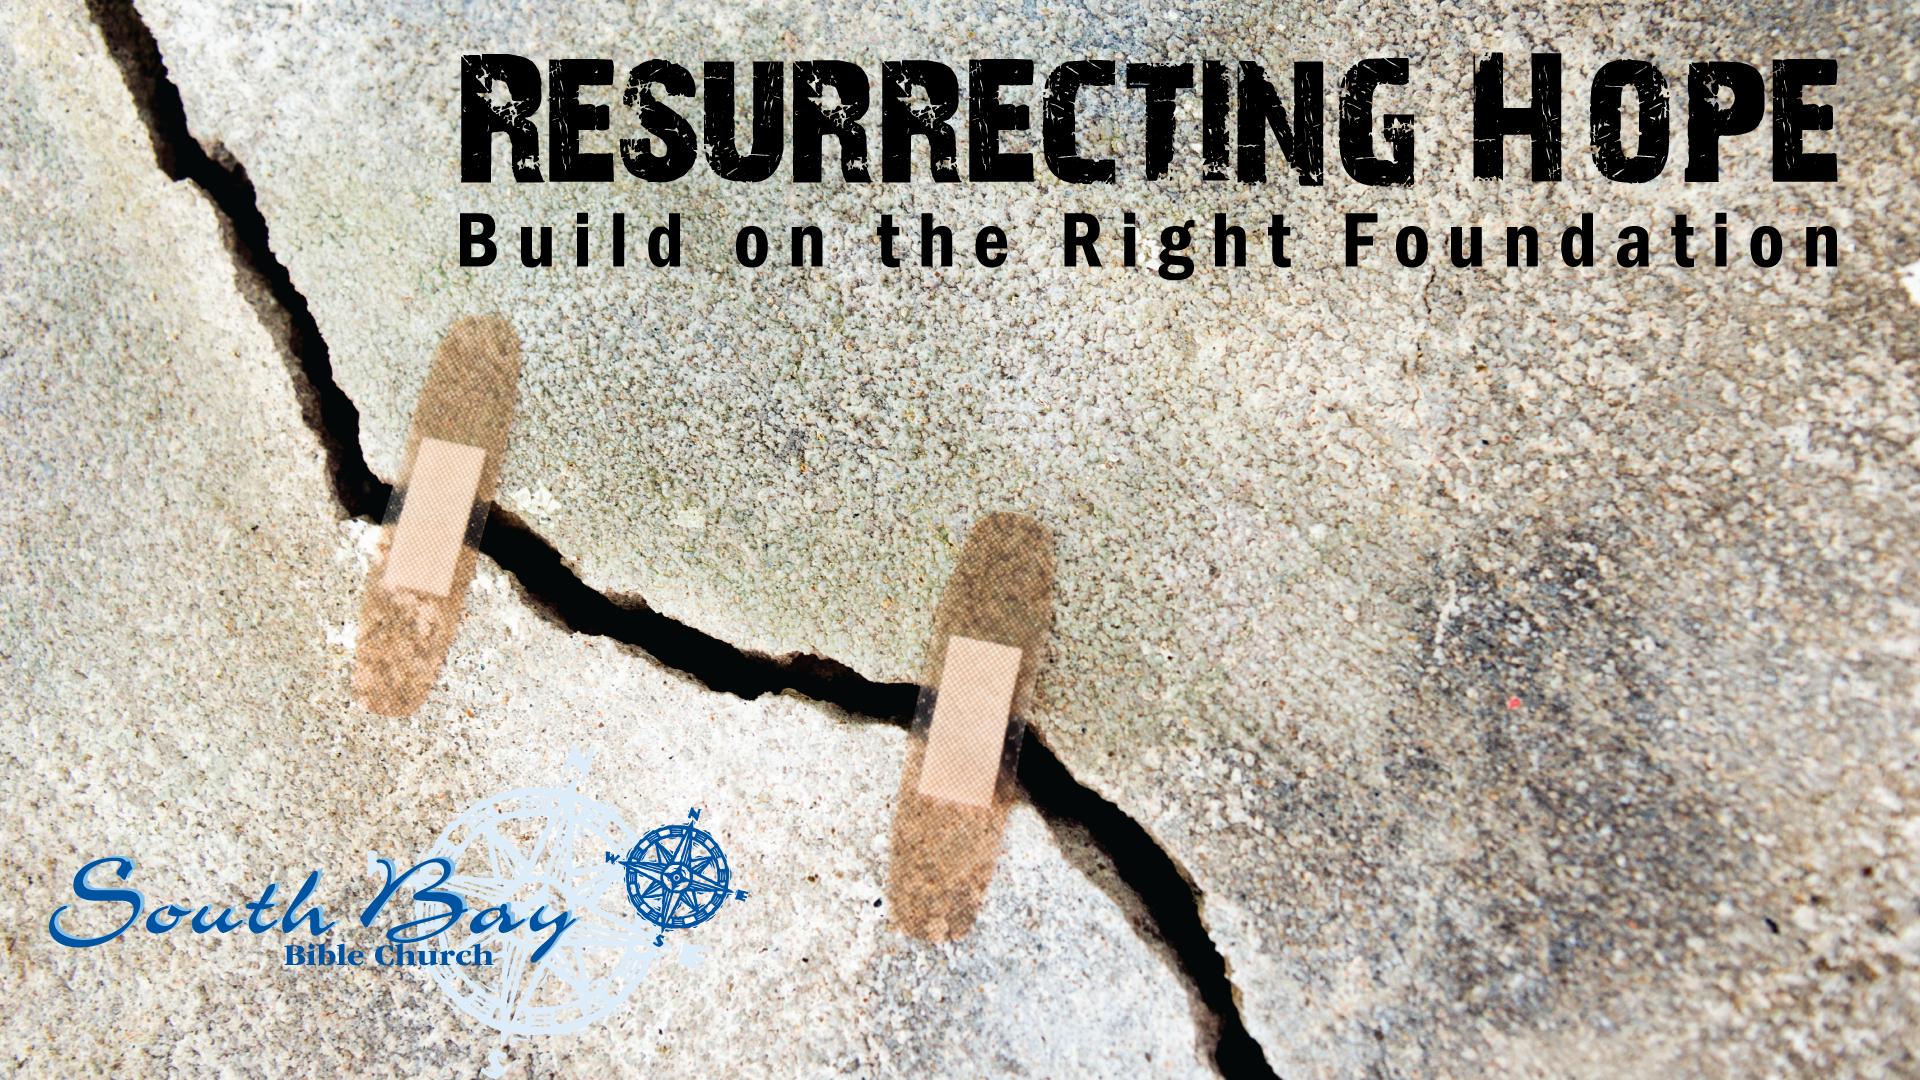 Resurrecting-Hope-1920x1080